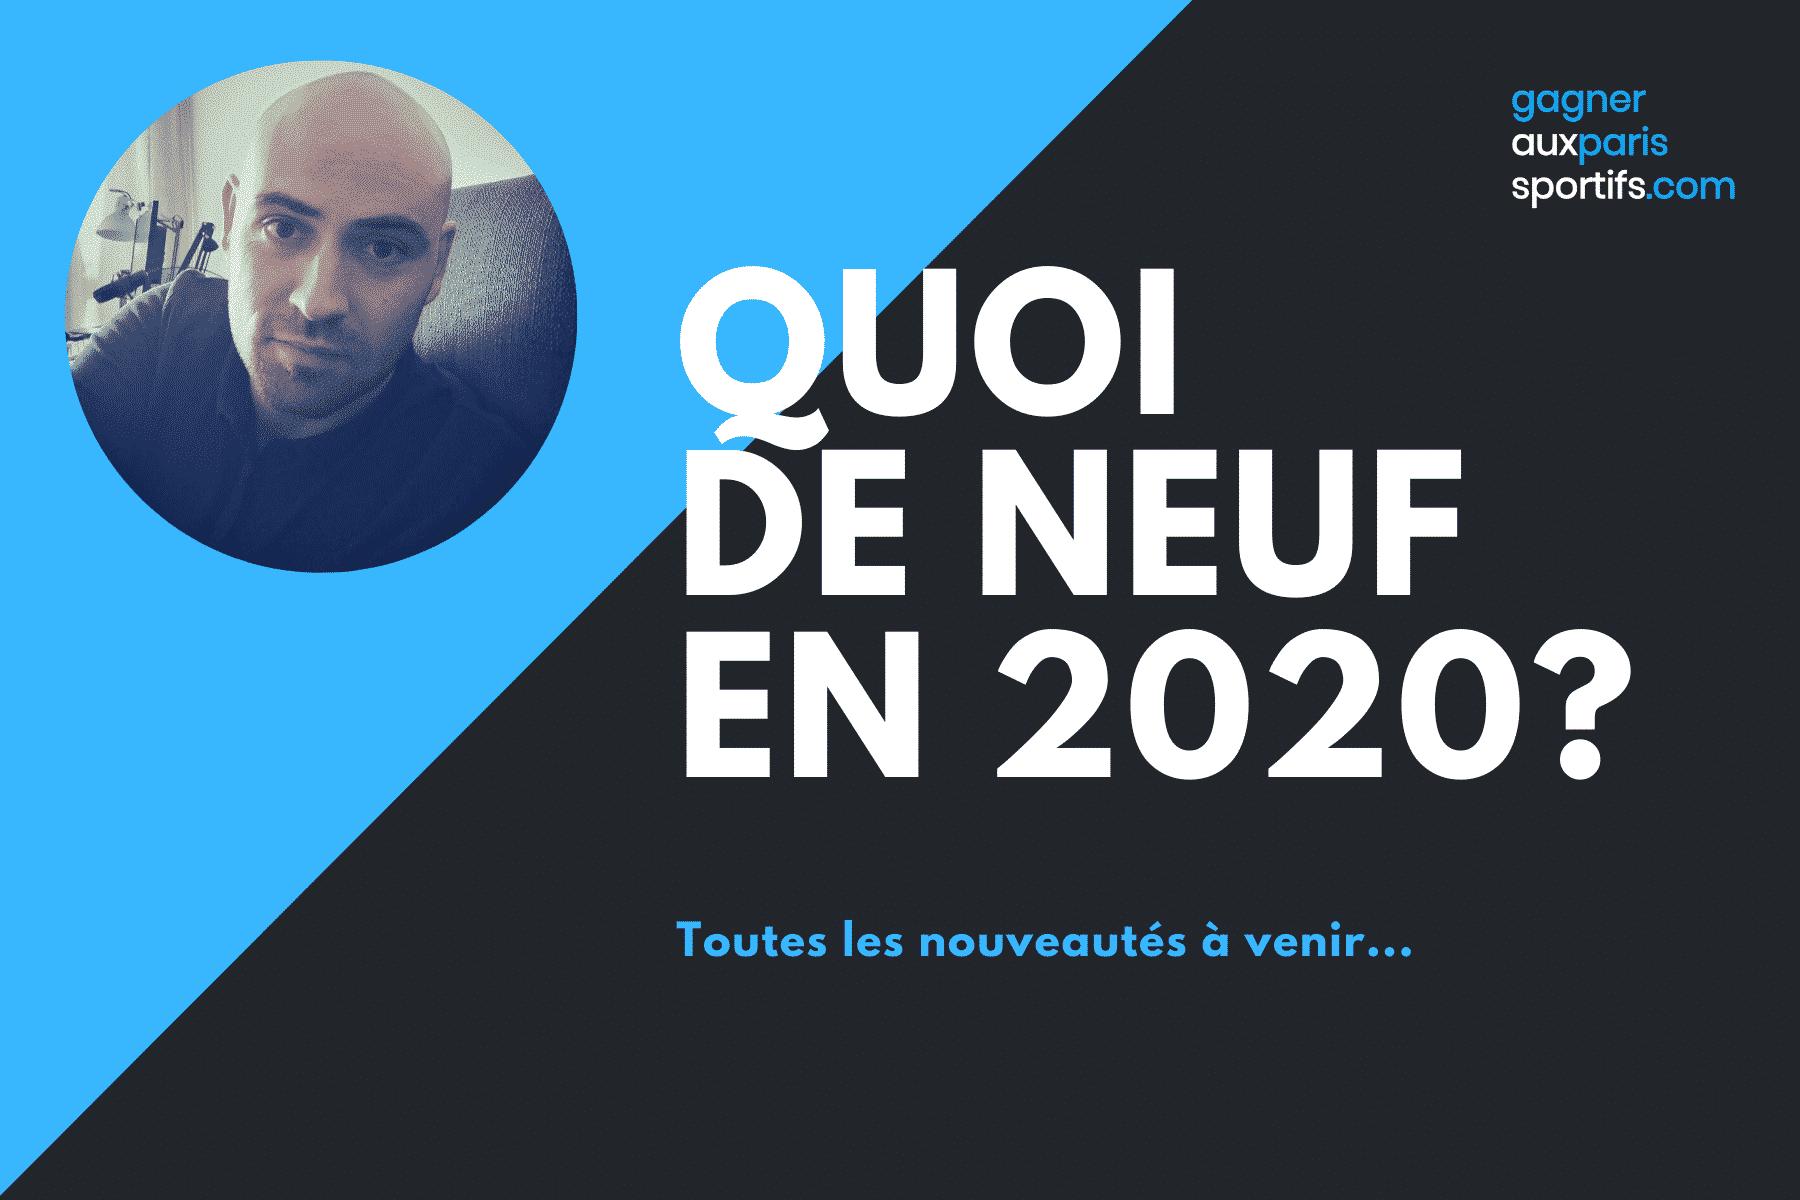 QUOI DE NEUF EN 2020